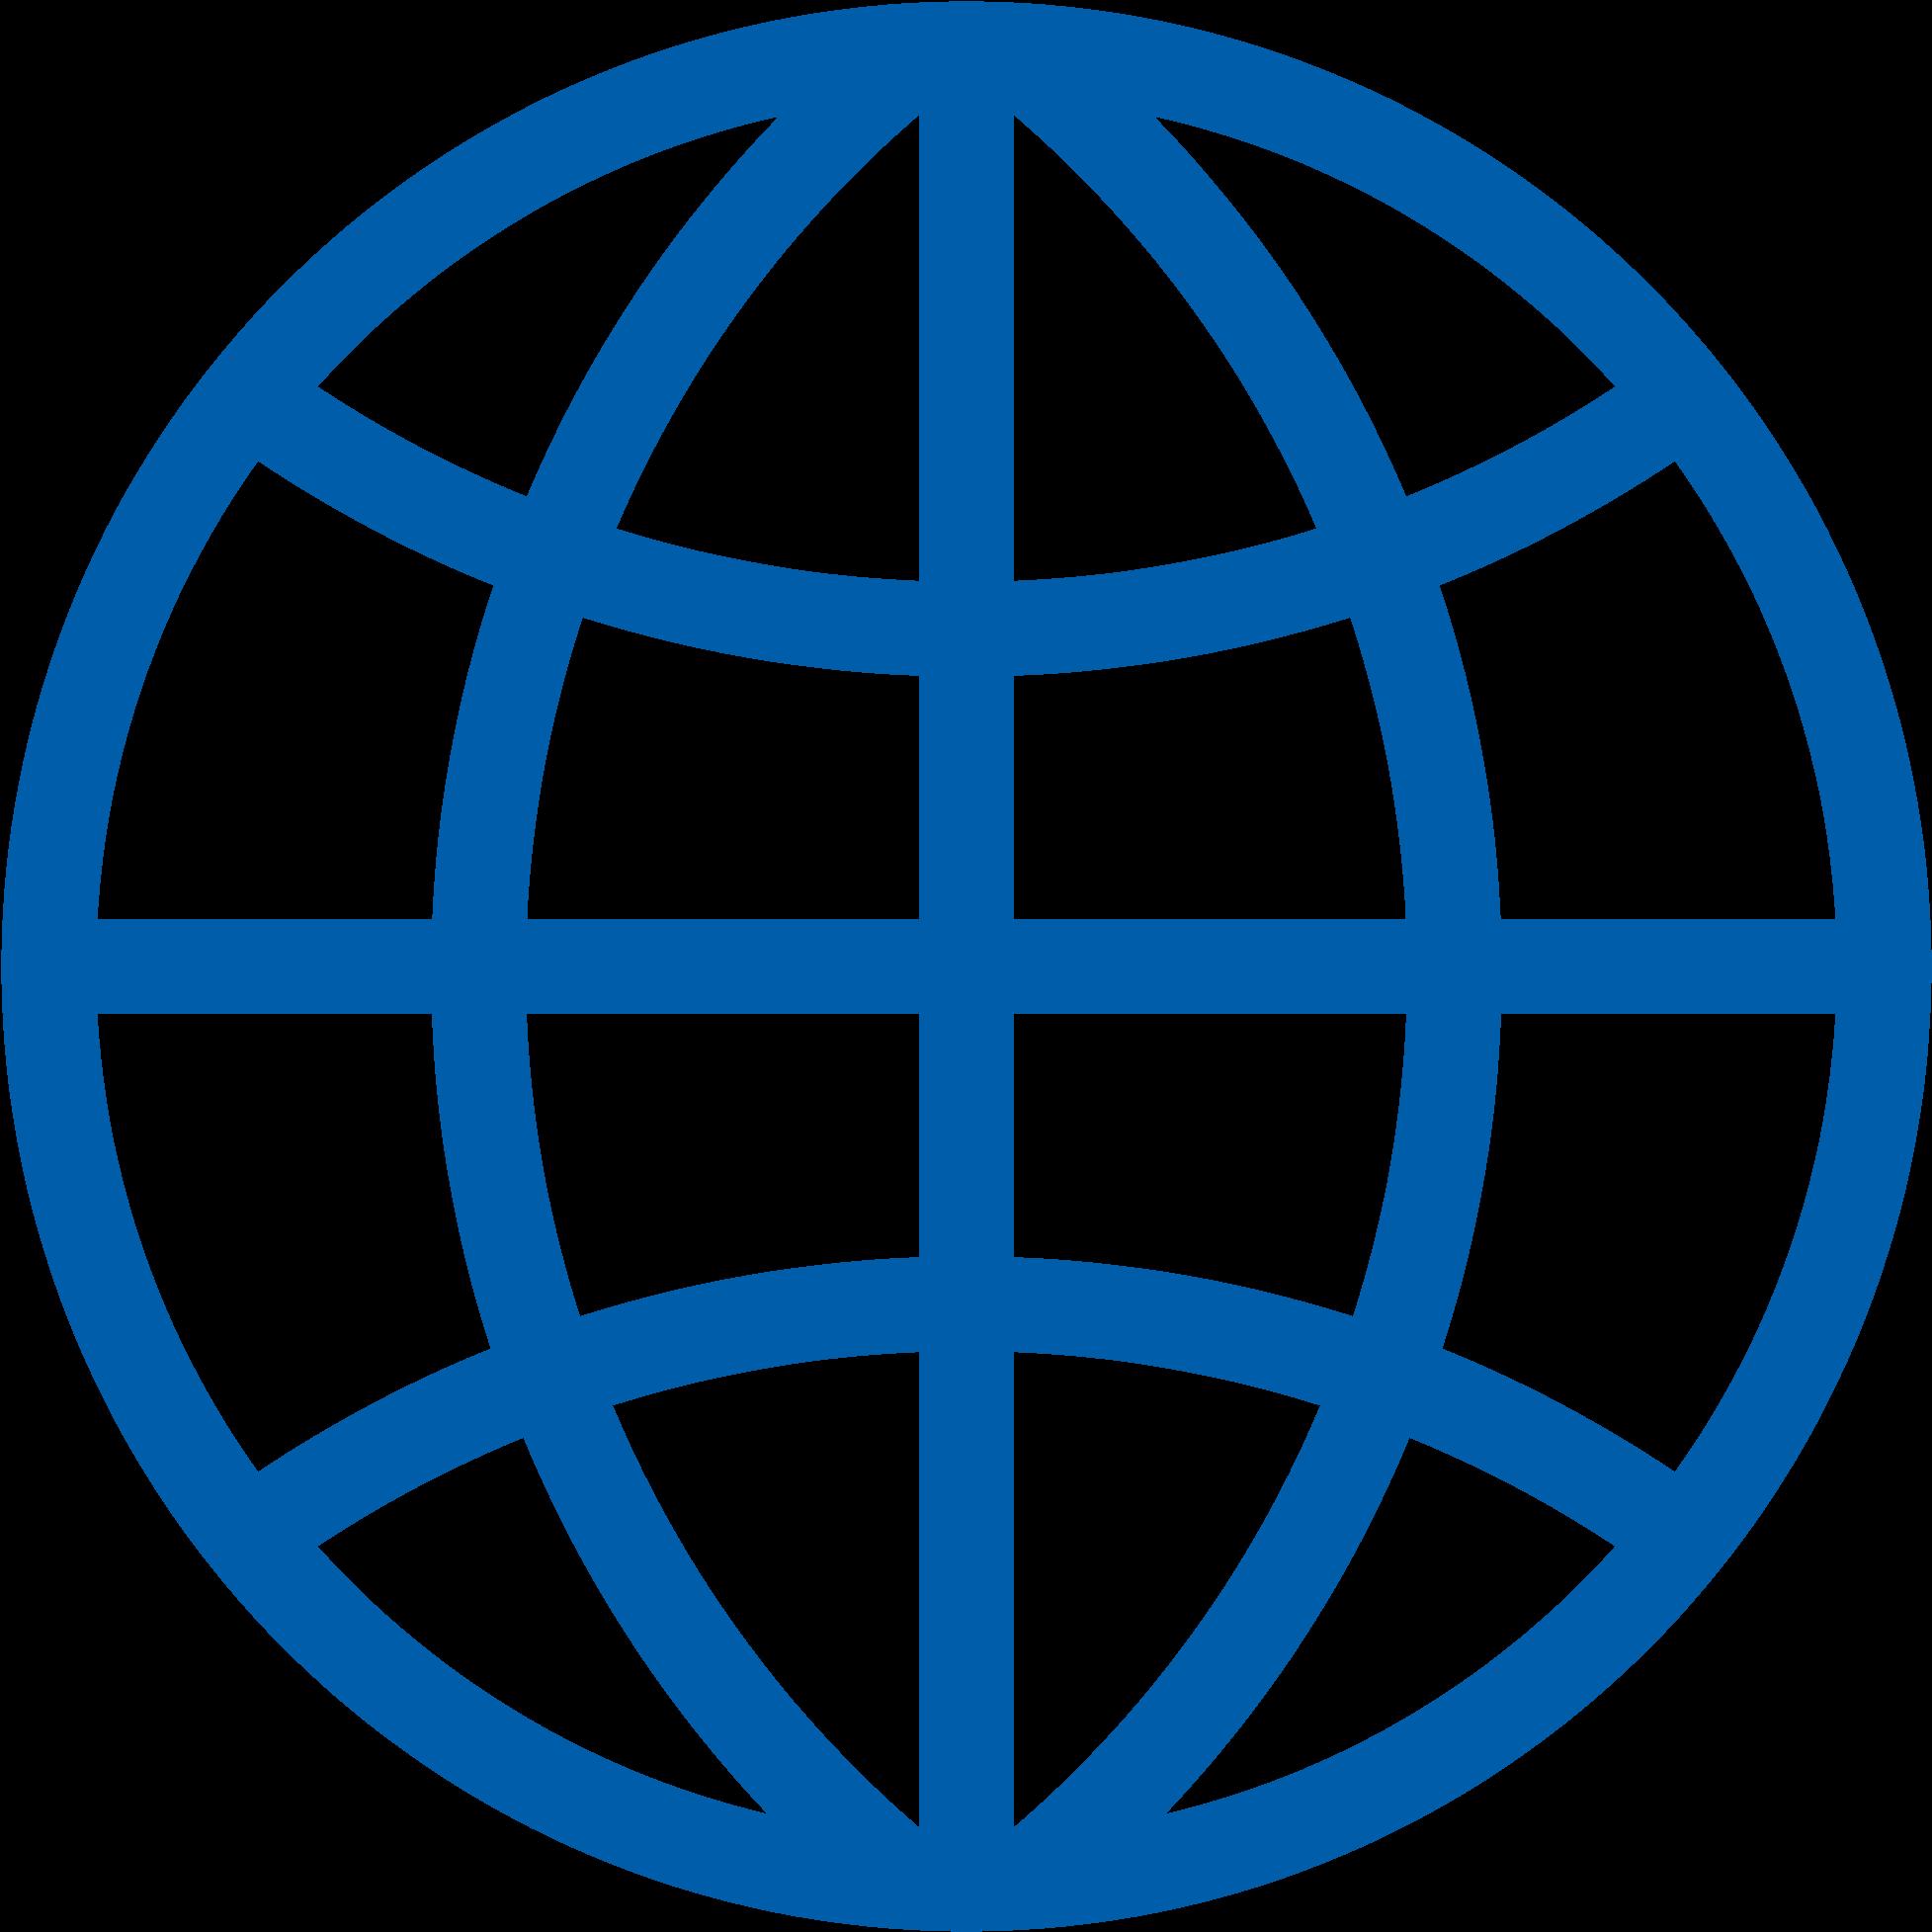 Website - Website Logo Png Transparent Background Clipart - Full Size  Clipart (#2116571) - PinClipart